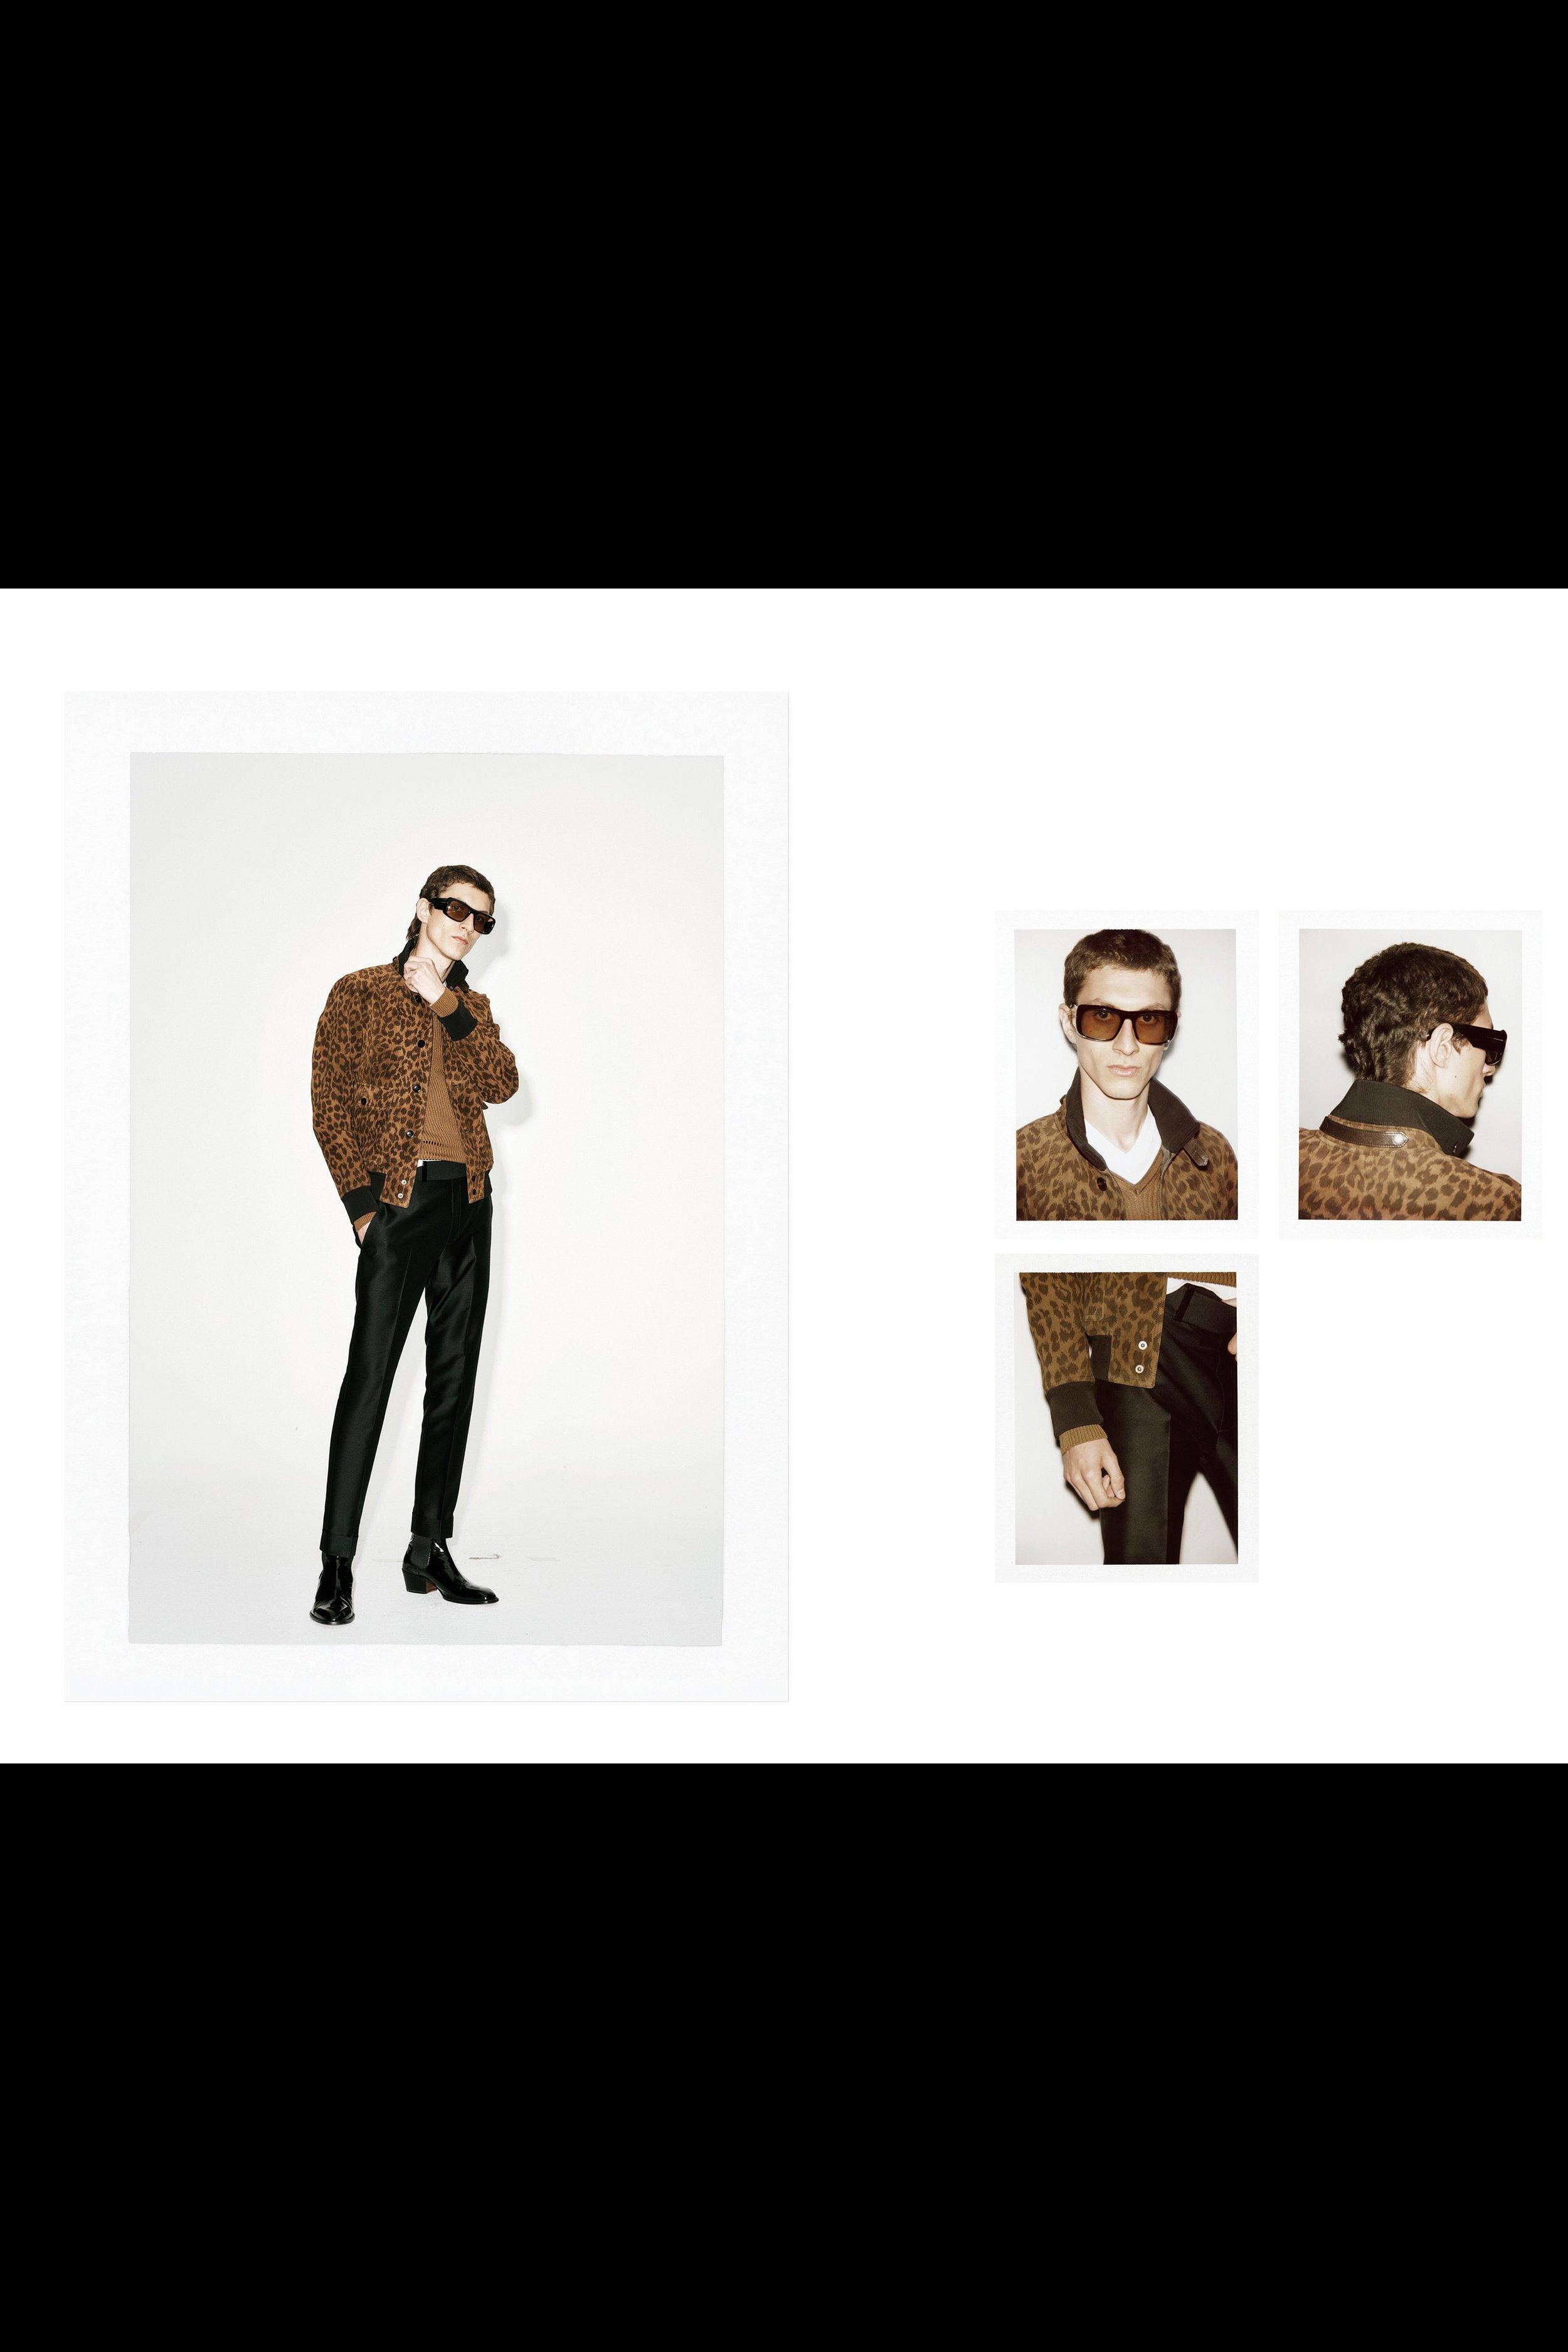 00023-Tom-Ford-vogue-menswear-spring-2019-pr.jpg